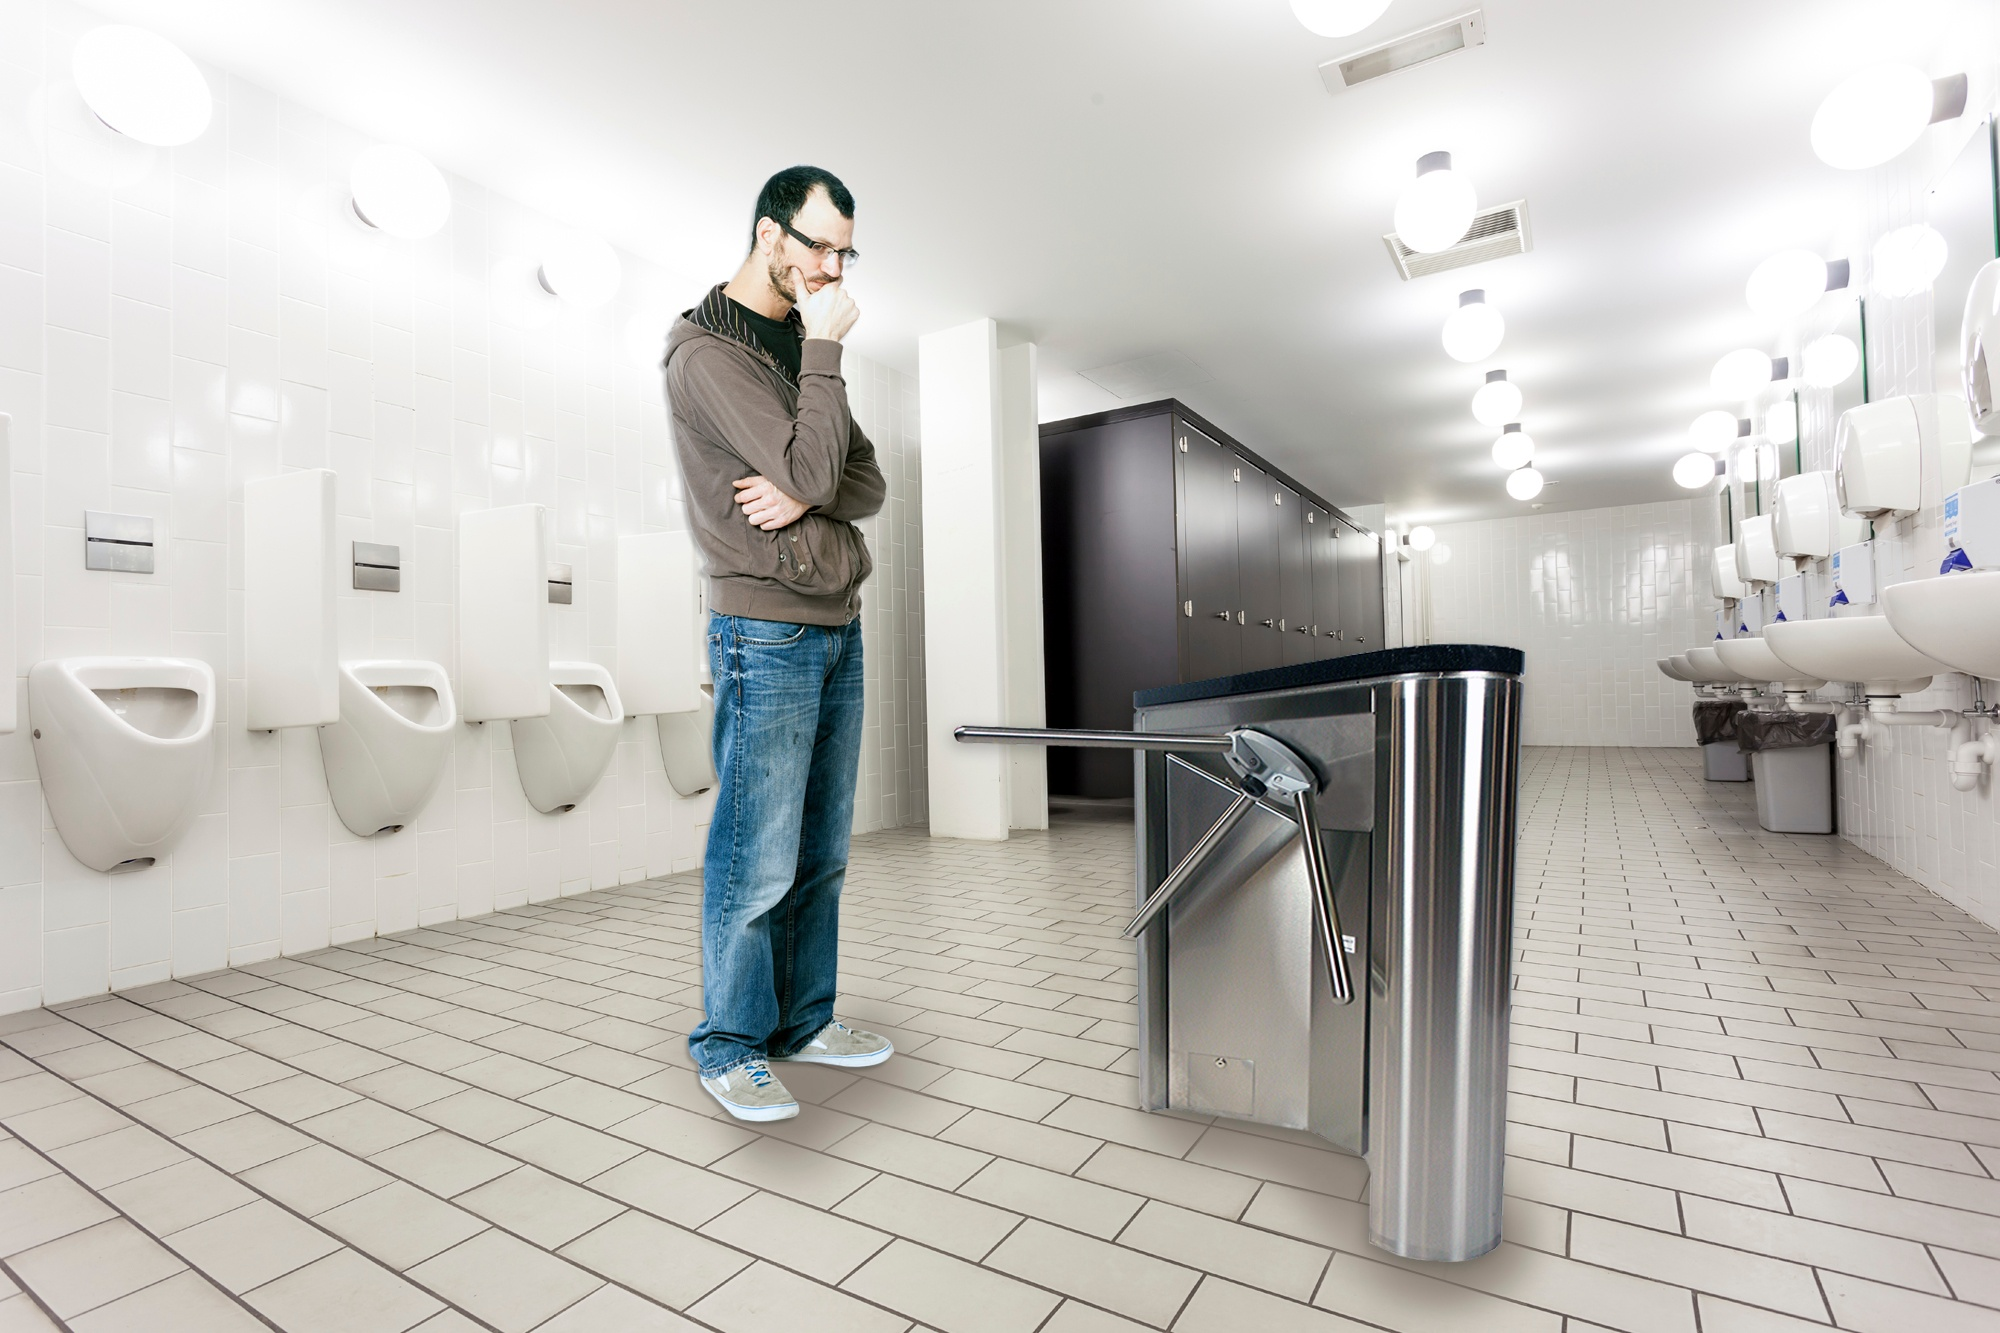 Turnstile in Bathroom.jpg